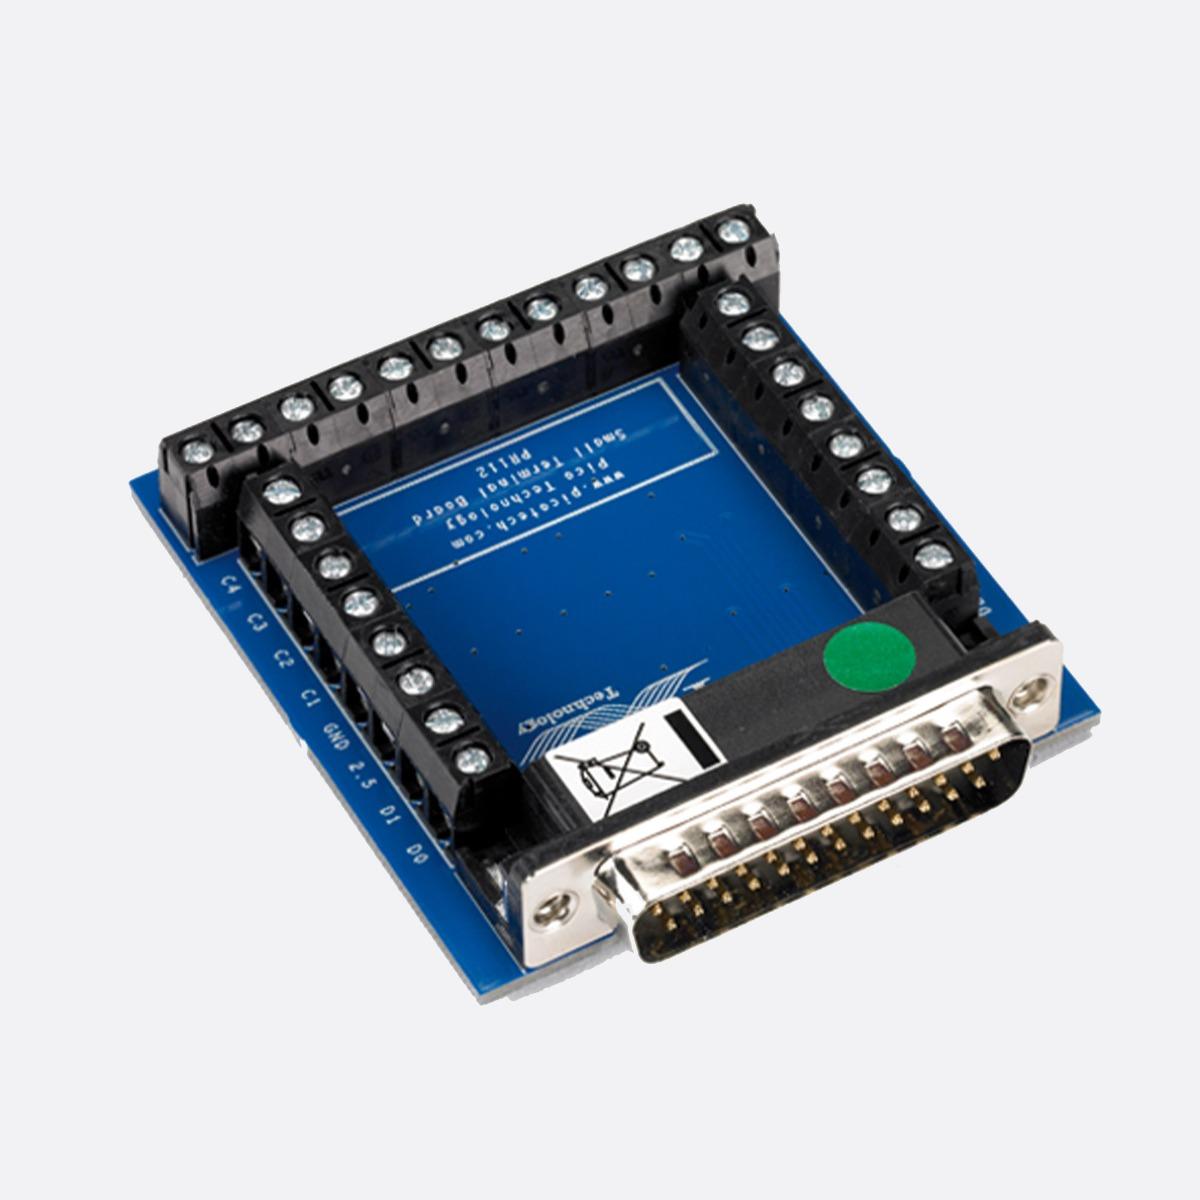 Pico_PP545_front_Ccontrols